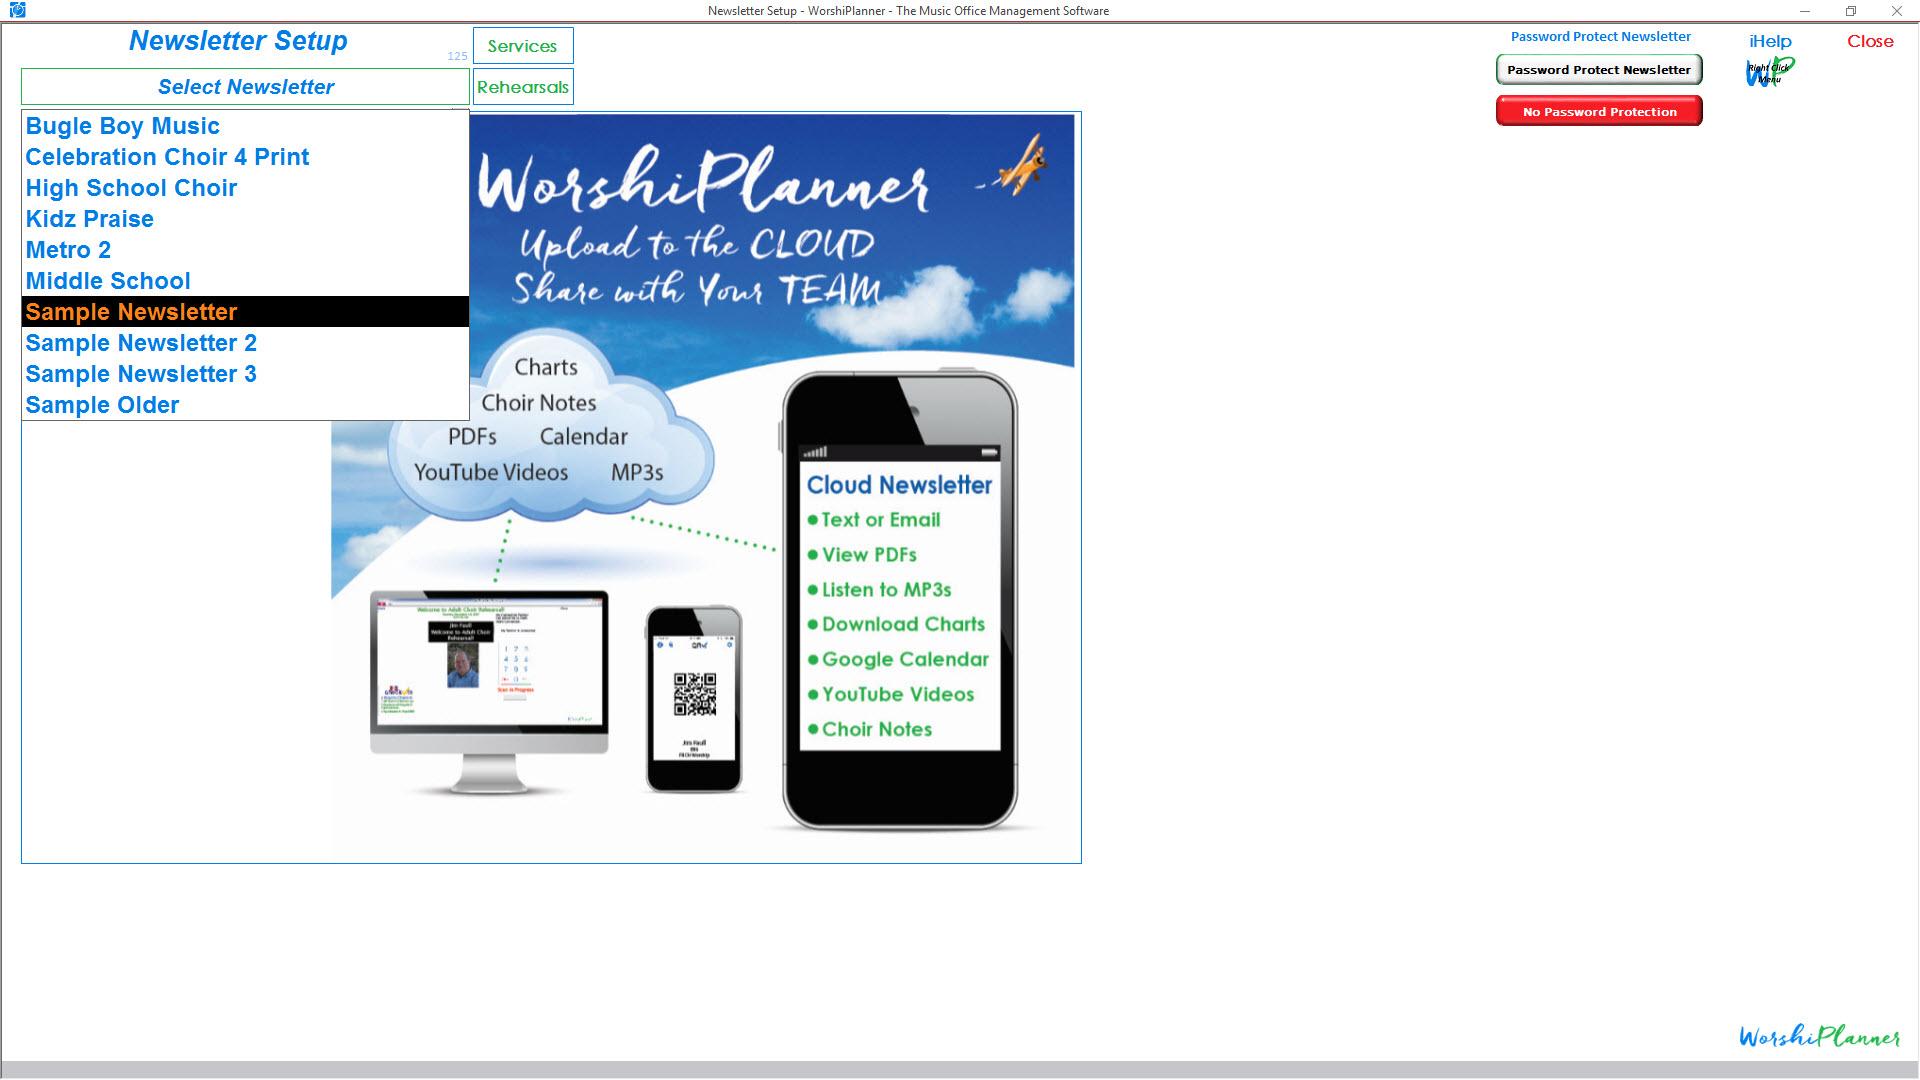 WP-News-Setup-1